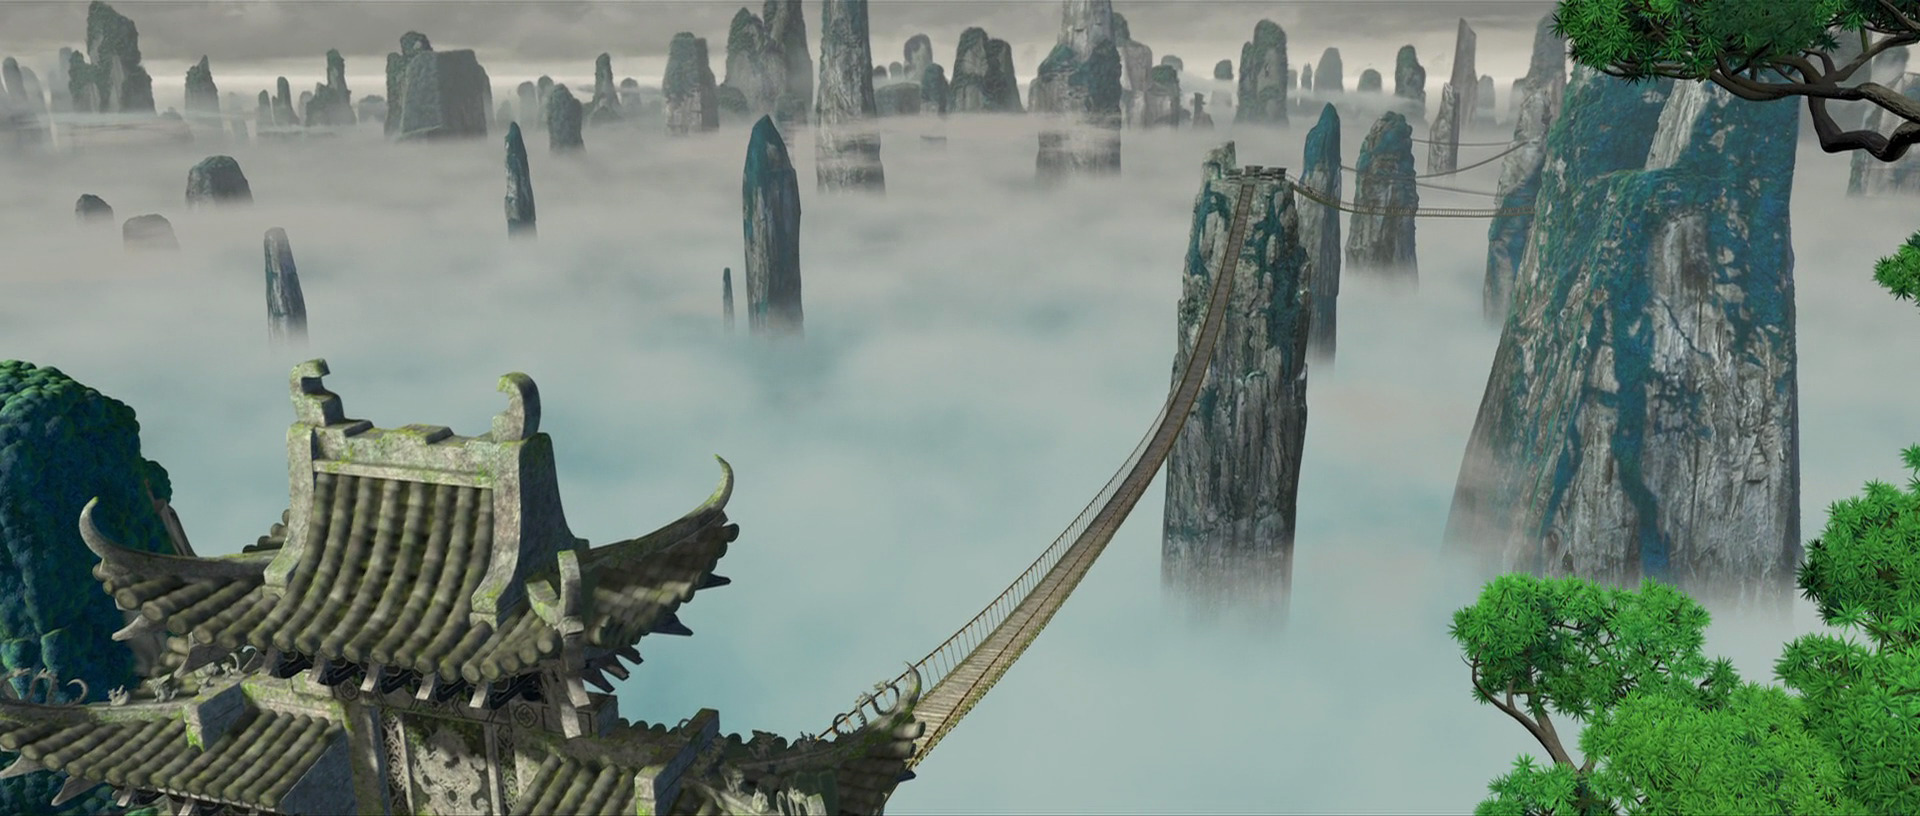 Cliffs of the Great Awakening